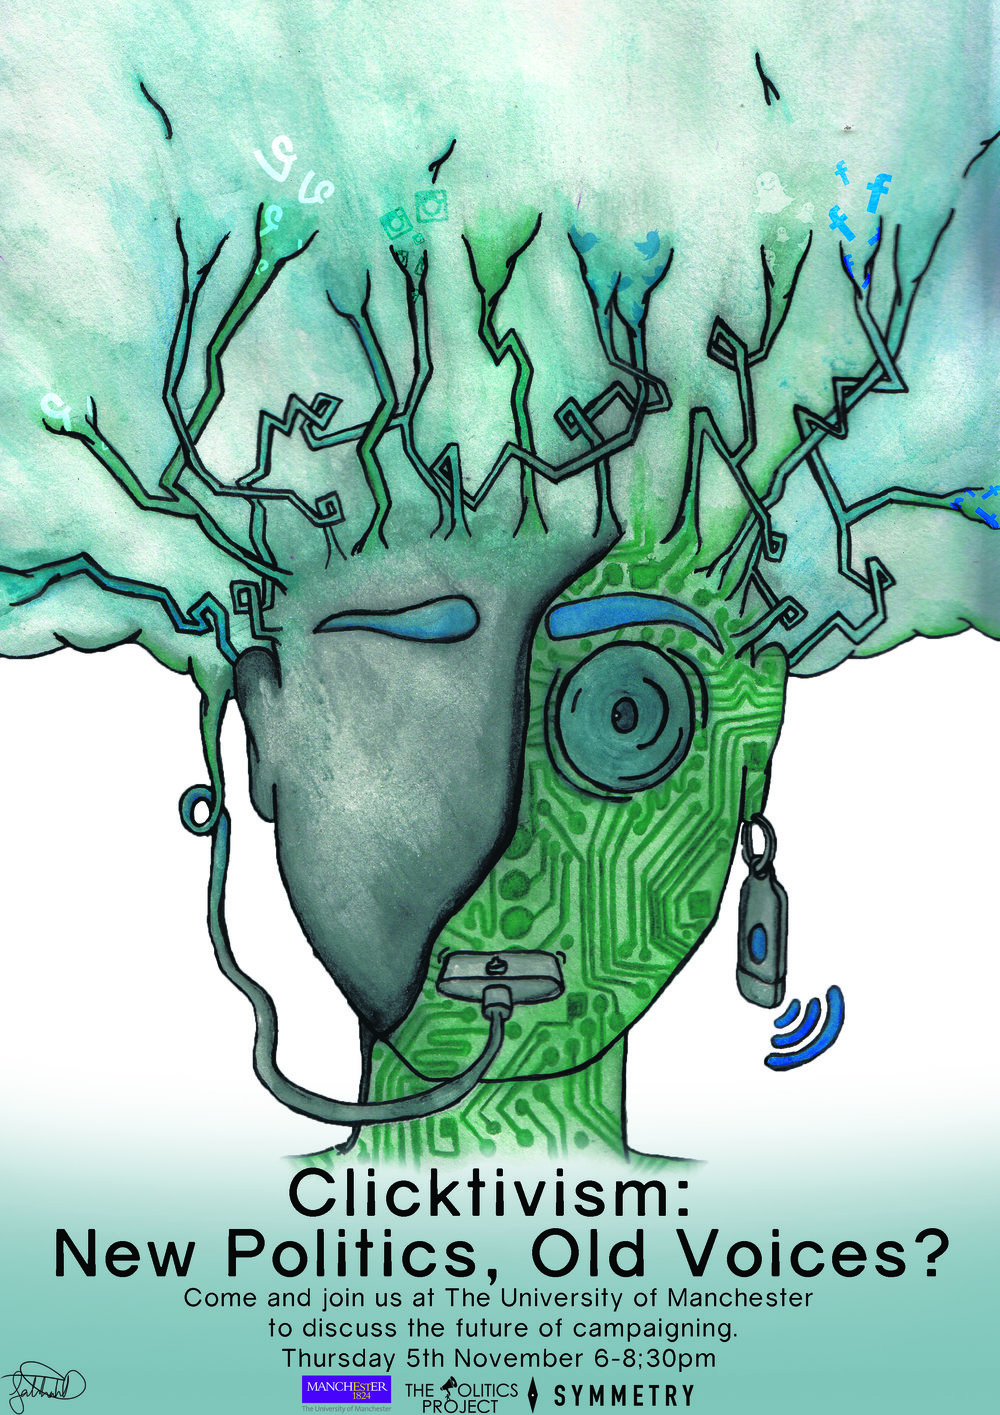 Clicktivism Dig Green (1).jpg